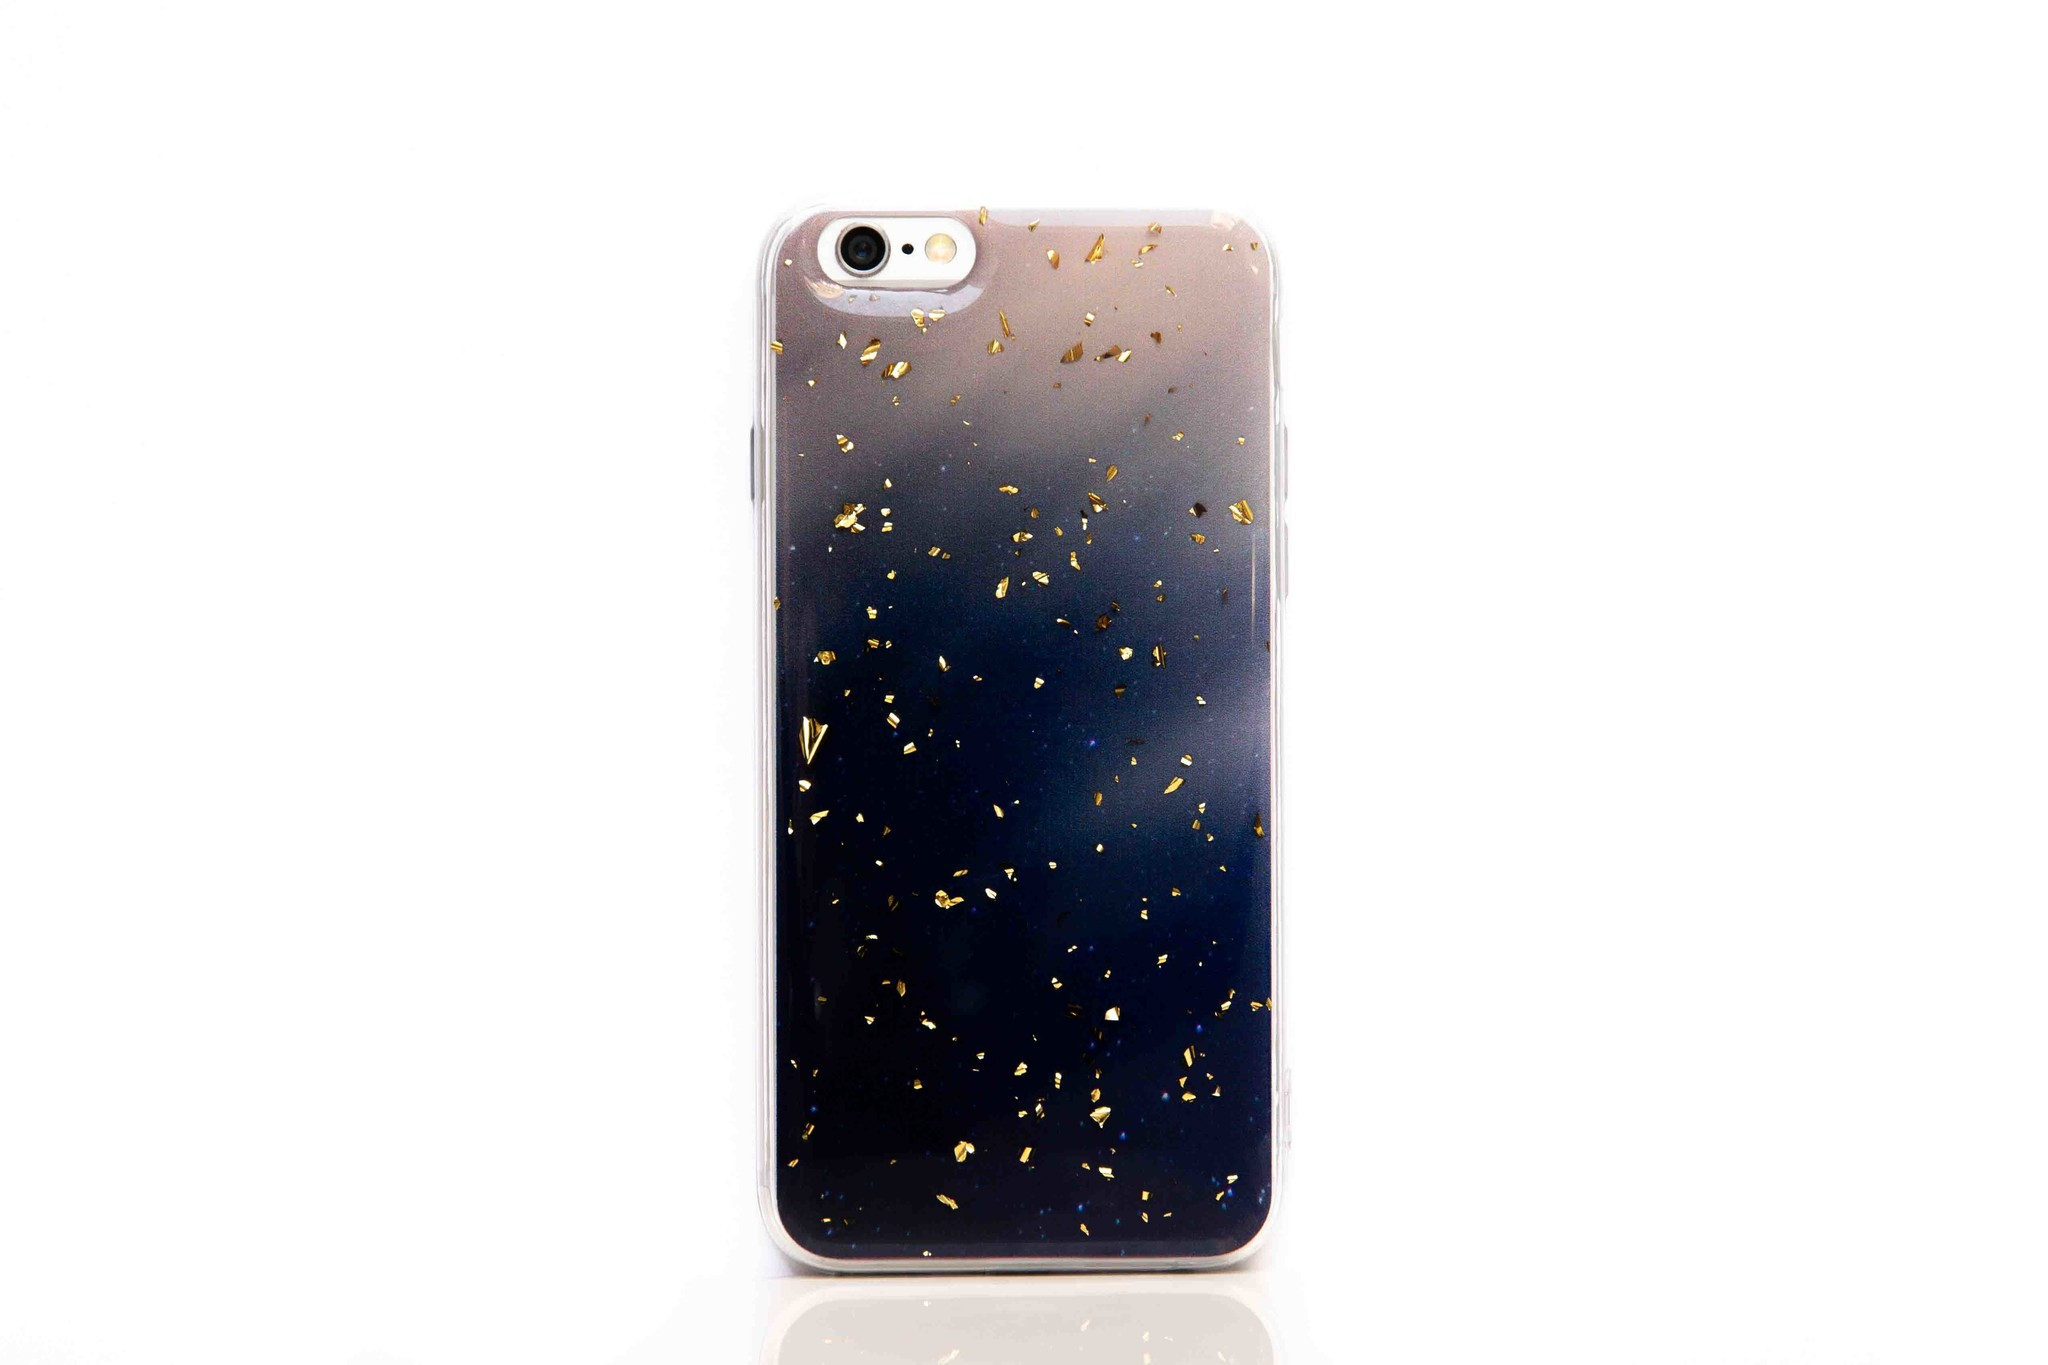 Smartphonehoesje iPhone 7 / 8 | Marmerlook (glitter) | Blauw / roze